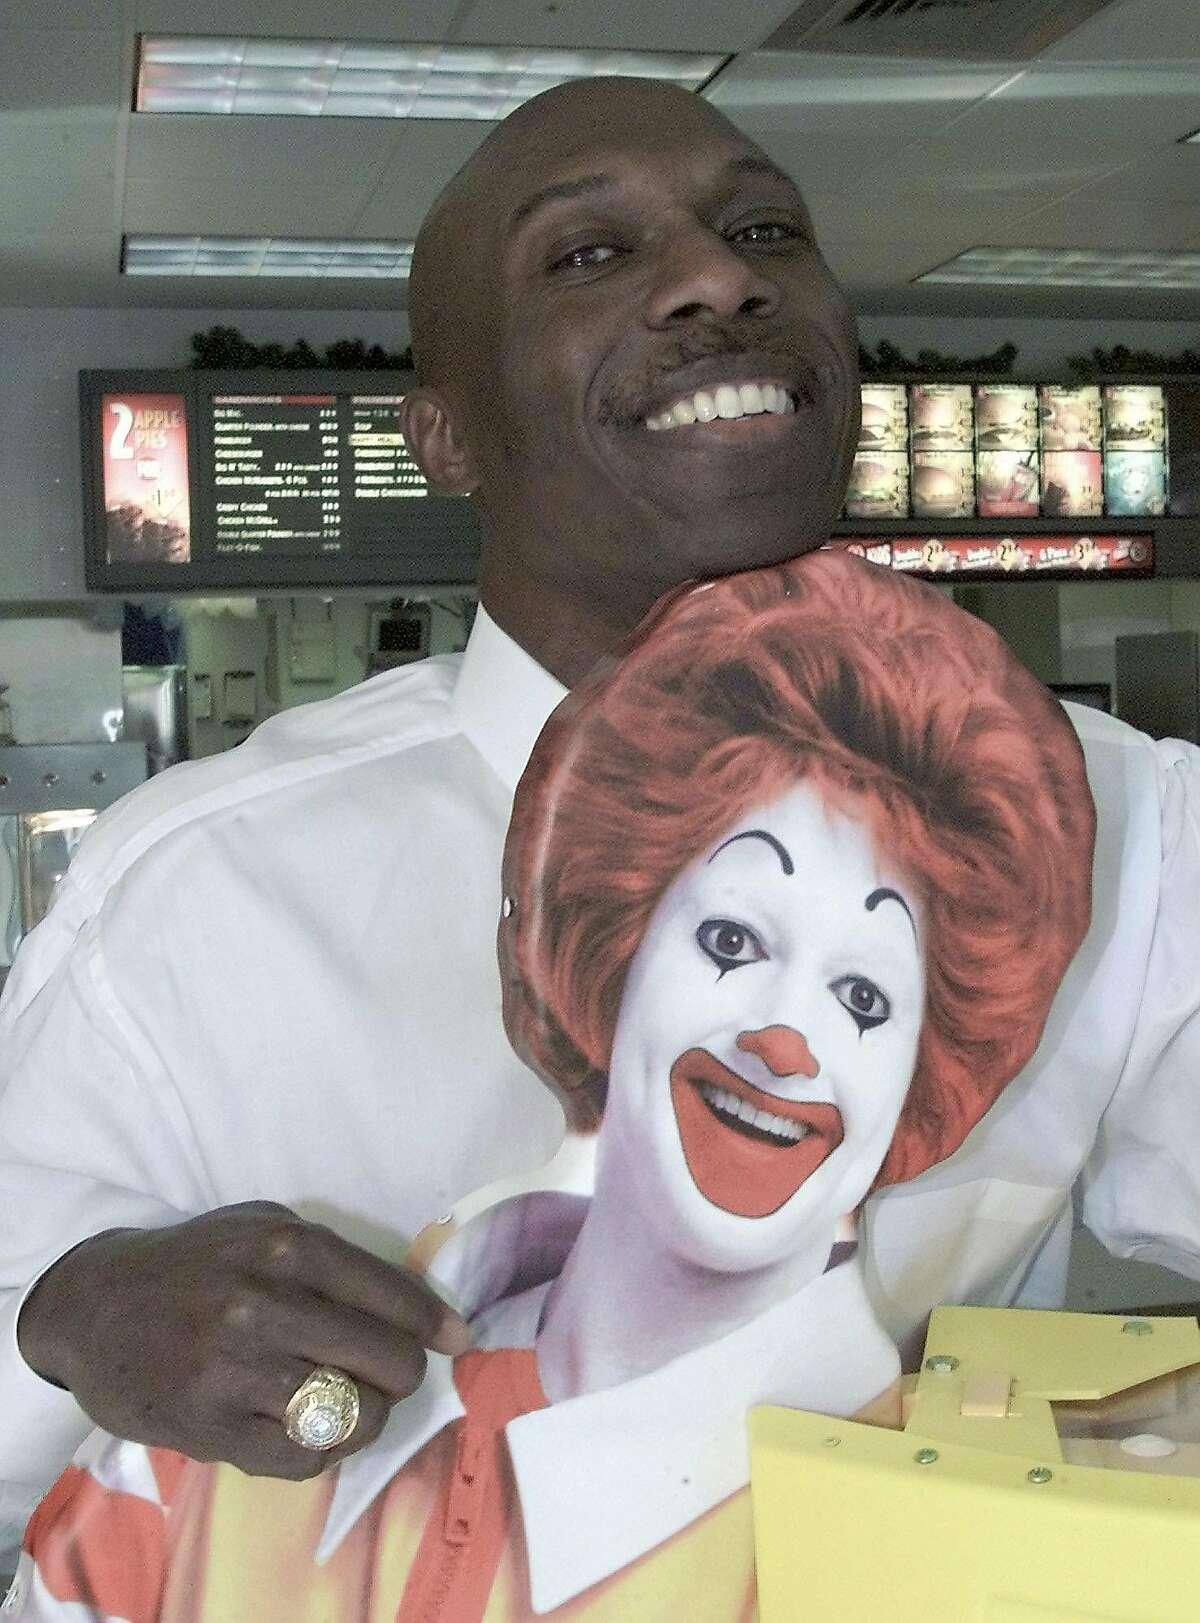 WASHINGTON1-03JAN02-SP-AP-- Herb Washington poses for a portrait in his McDonalds restaraunt in Niles, Ohio, Thursday, Jan. 3, 2002. (AP Photo/Ron Schwane)